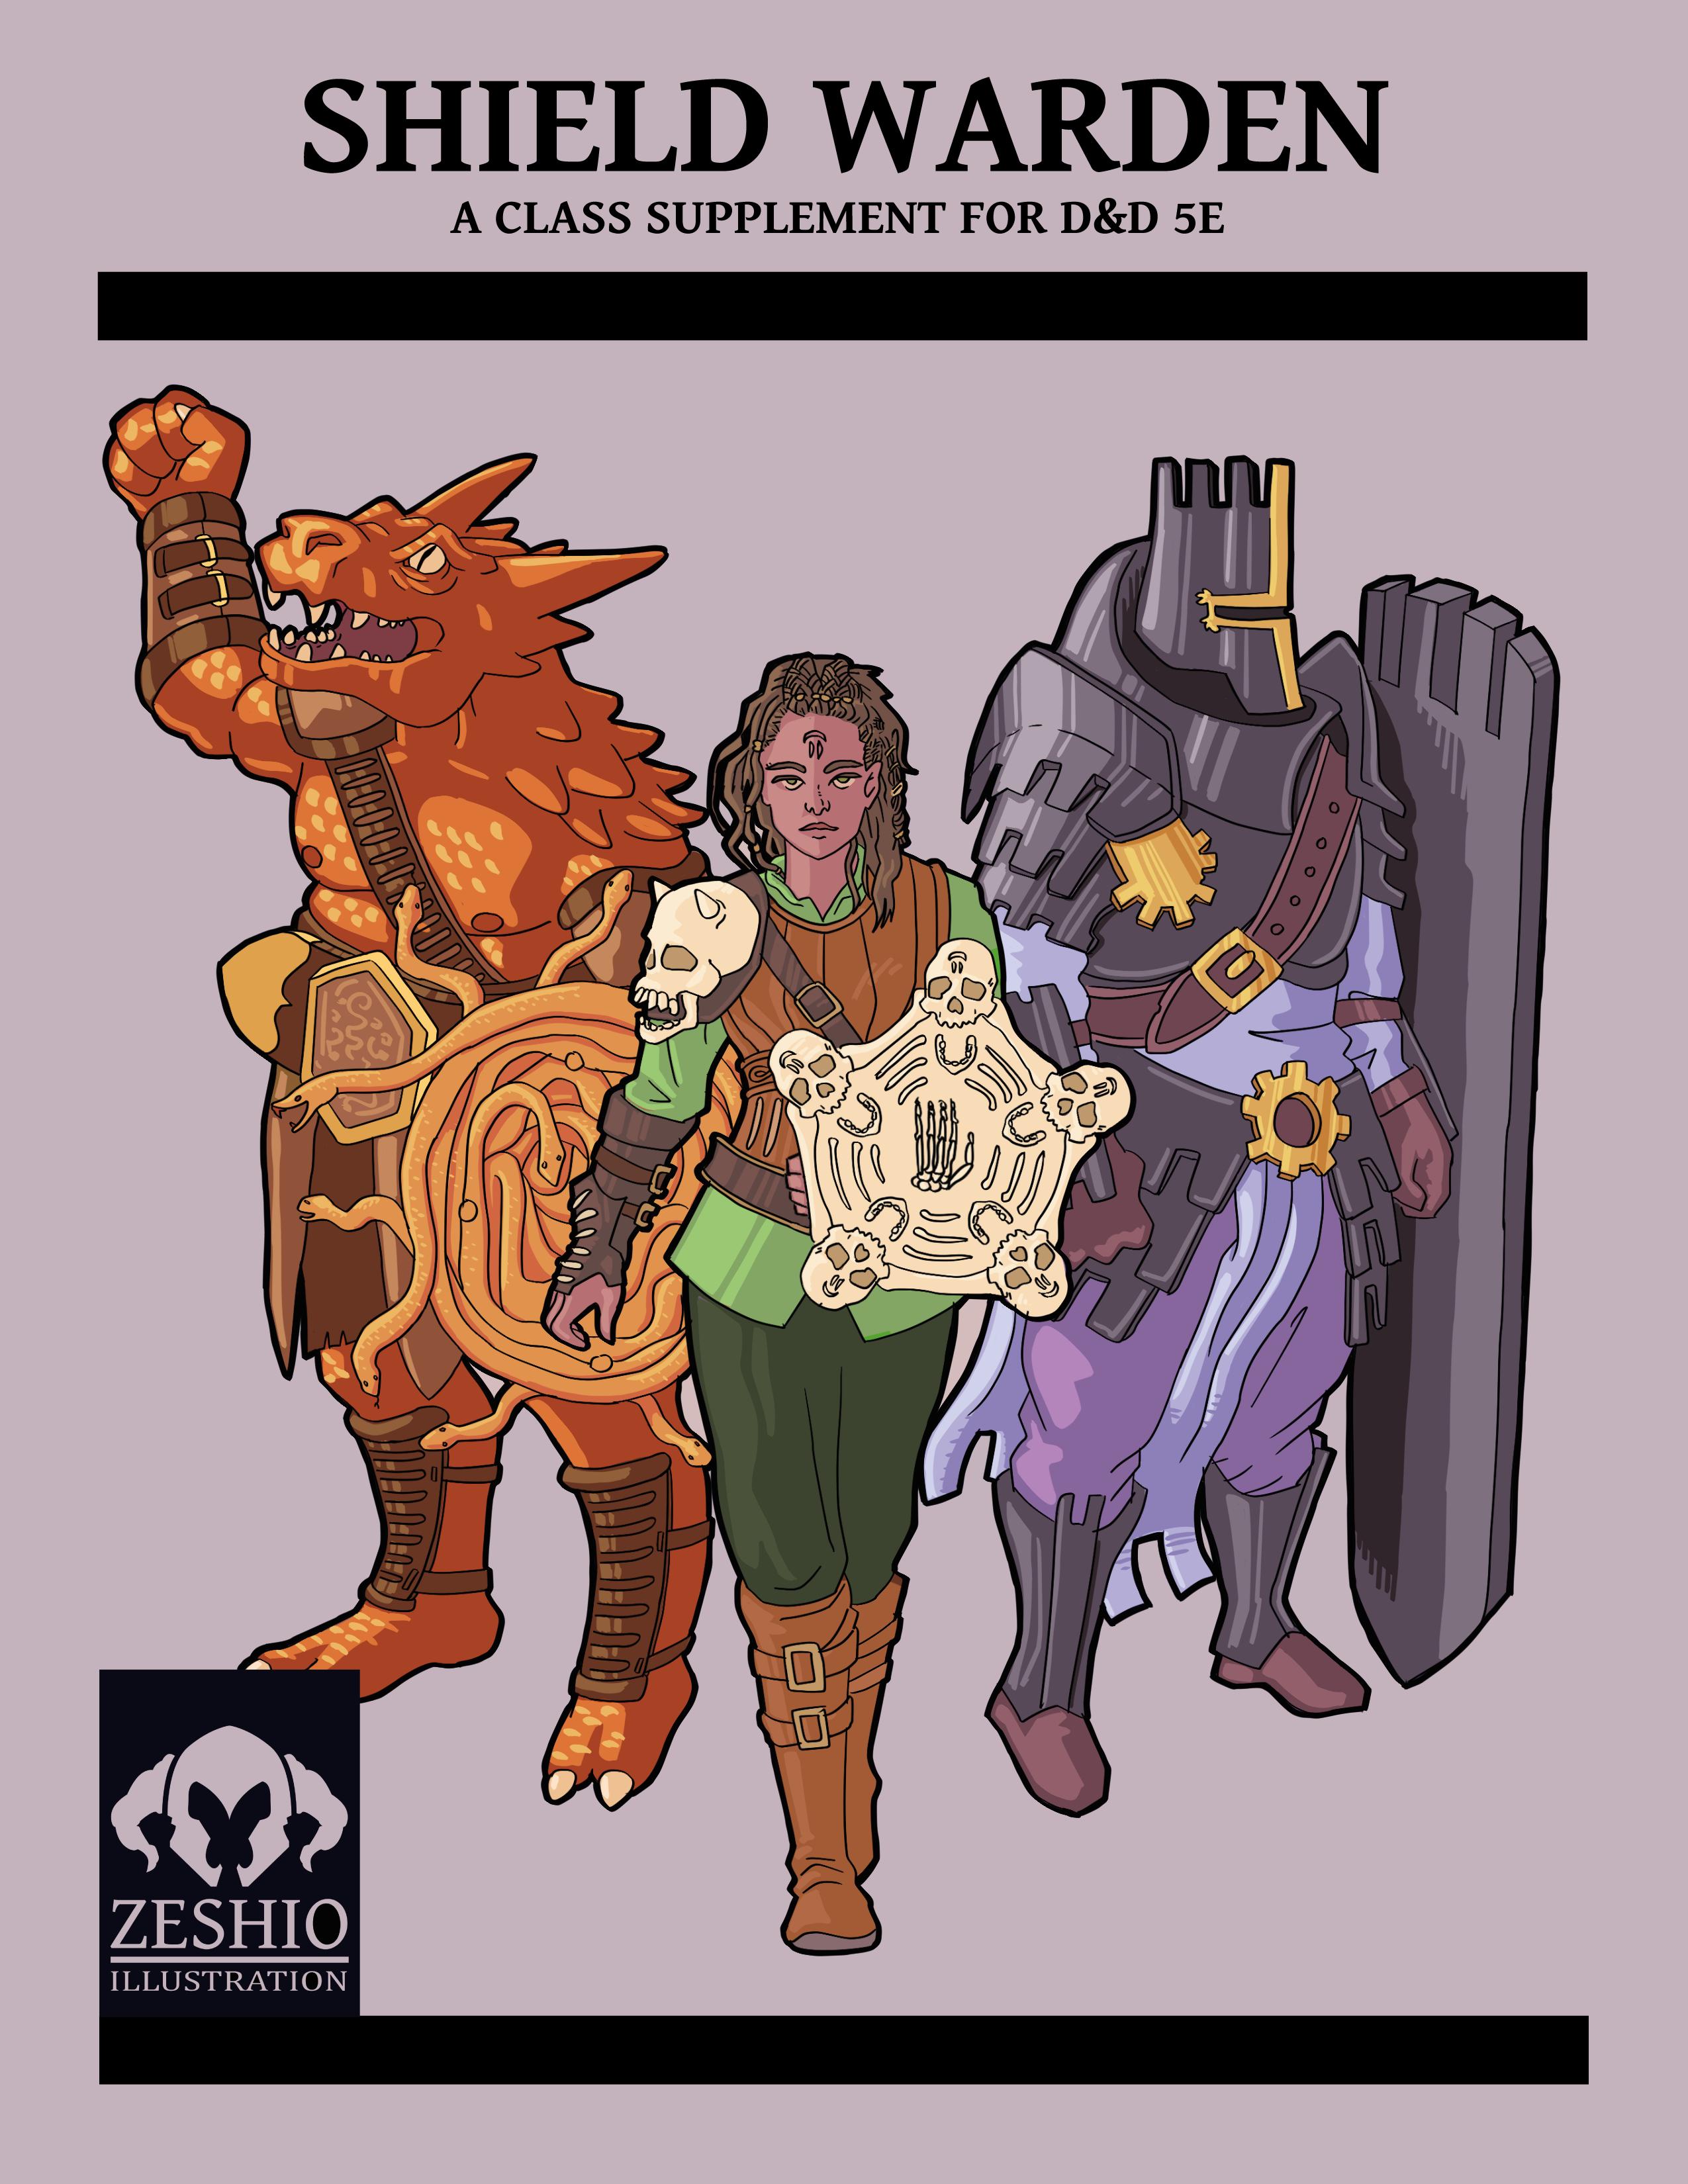 Zeshio's Shield Warden (D&D 5E Homebrew) by Zeshio